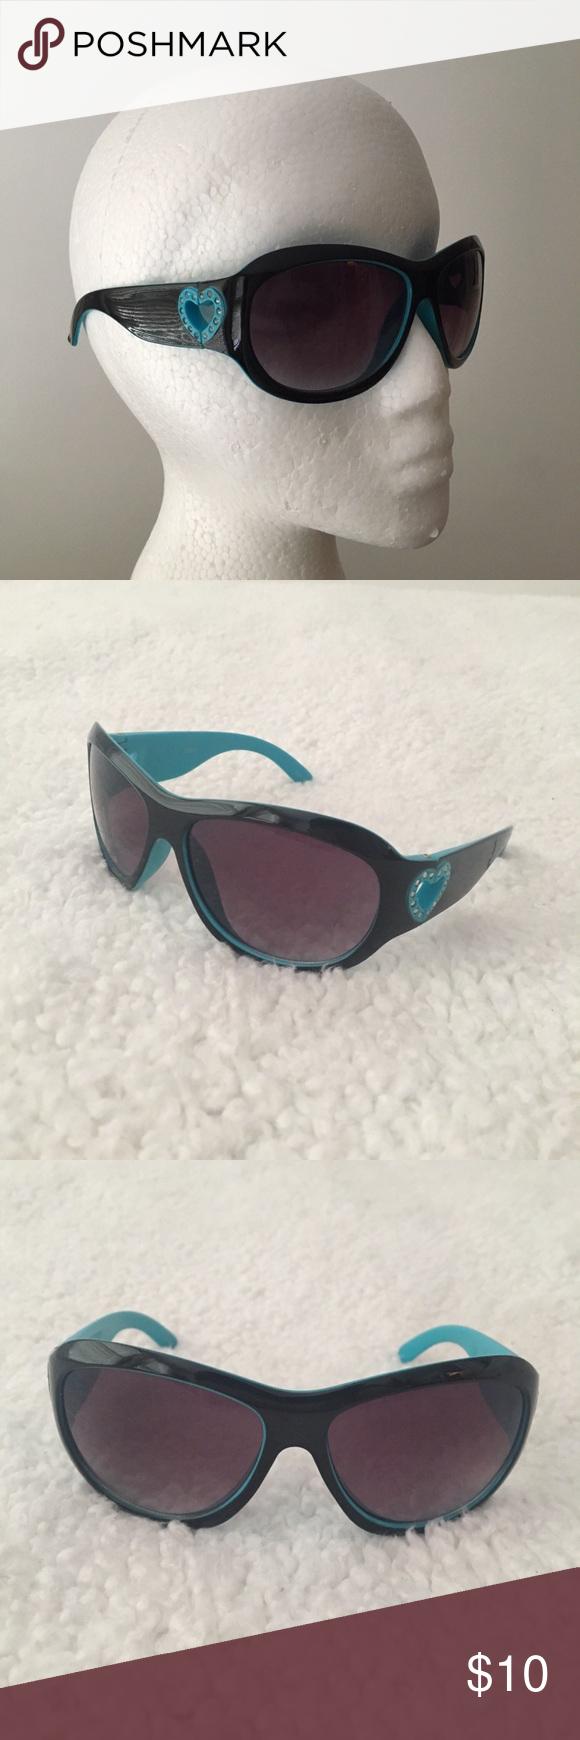 661044c876cf Vintage 2000s black heart sunglasses Vintage 2000s heart sunglasses with  light blue trim 💙🏁 These